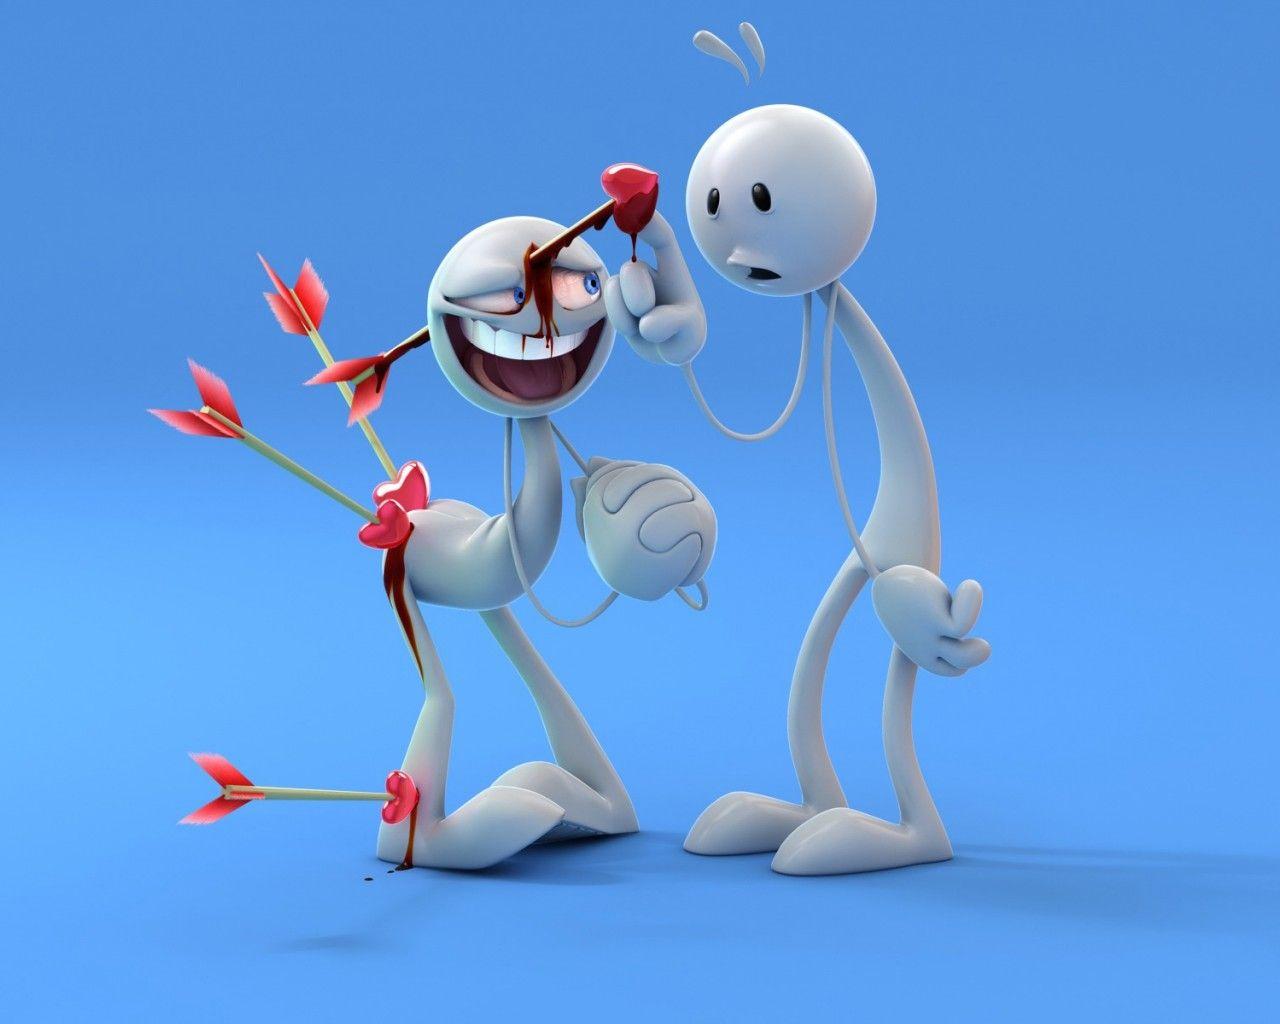 Wonderful Cartoon Love HD Wallpaper Free Download - f2f0b88bfeb099304a07a9df37be9dcb  Graphic_789146.jpg